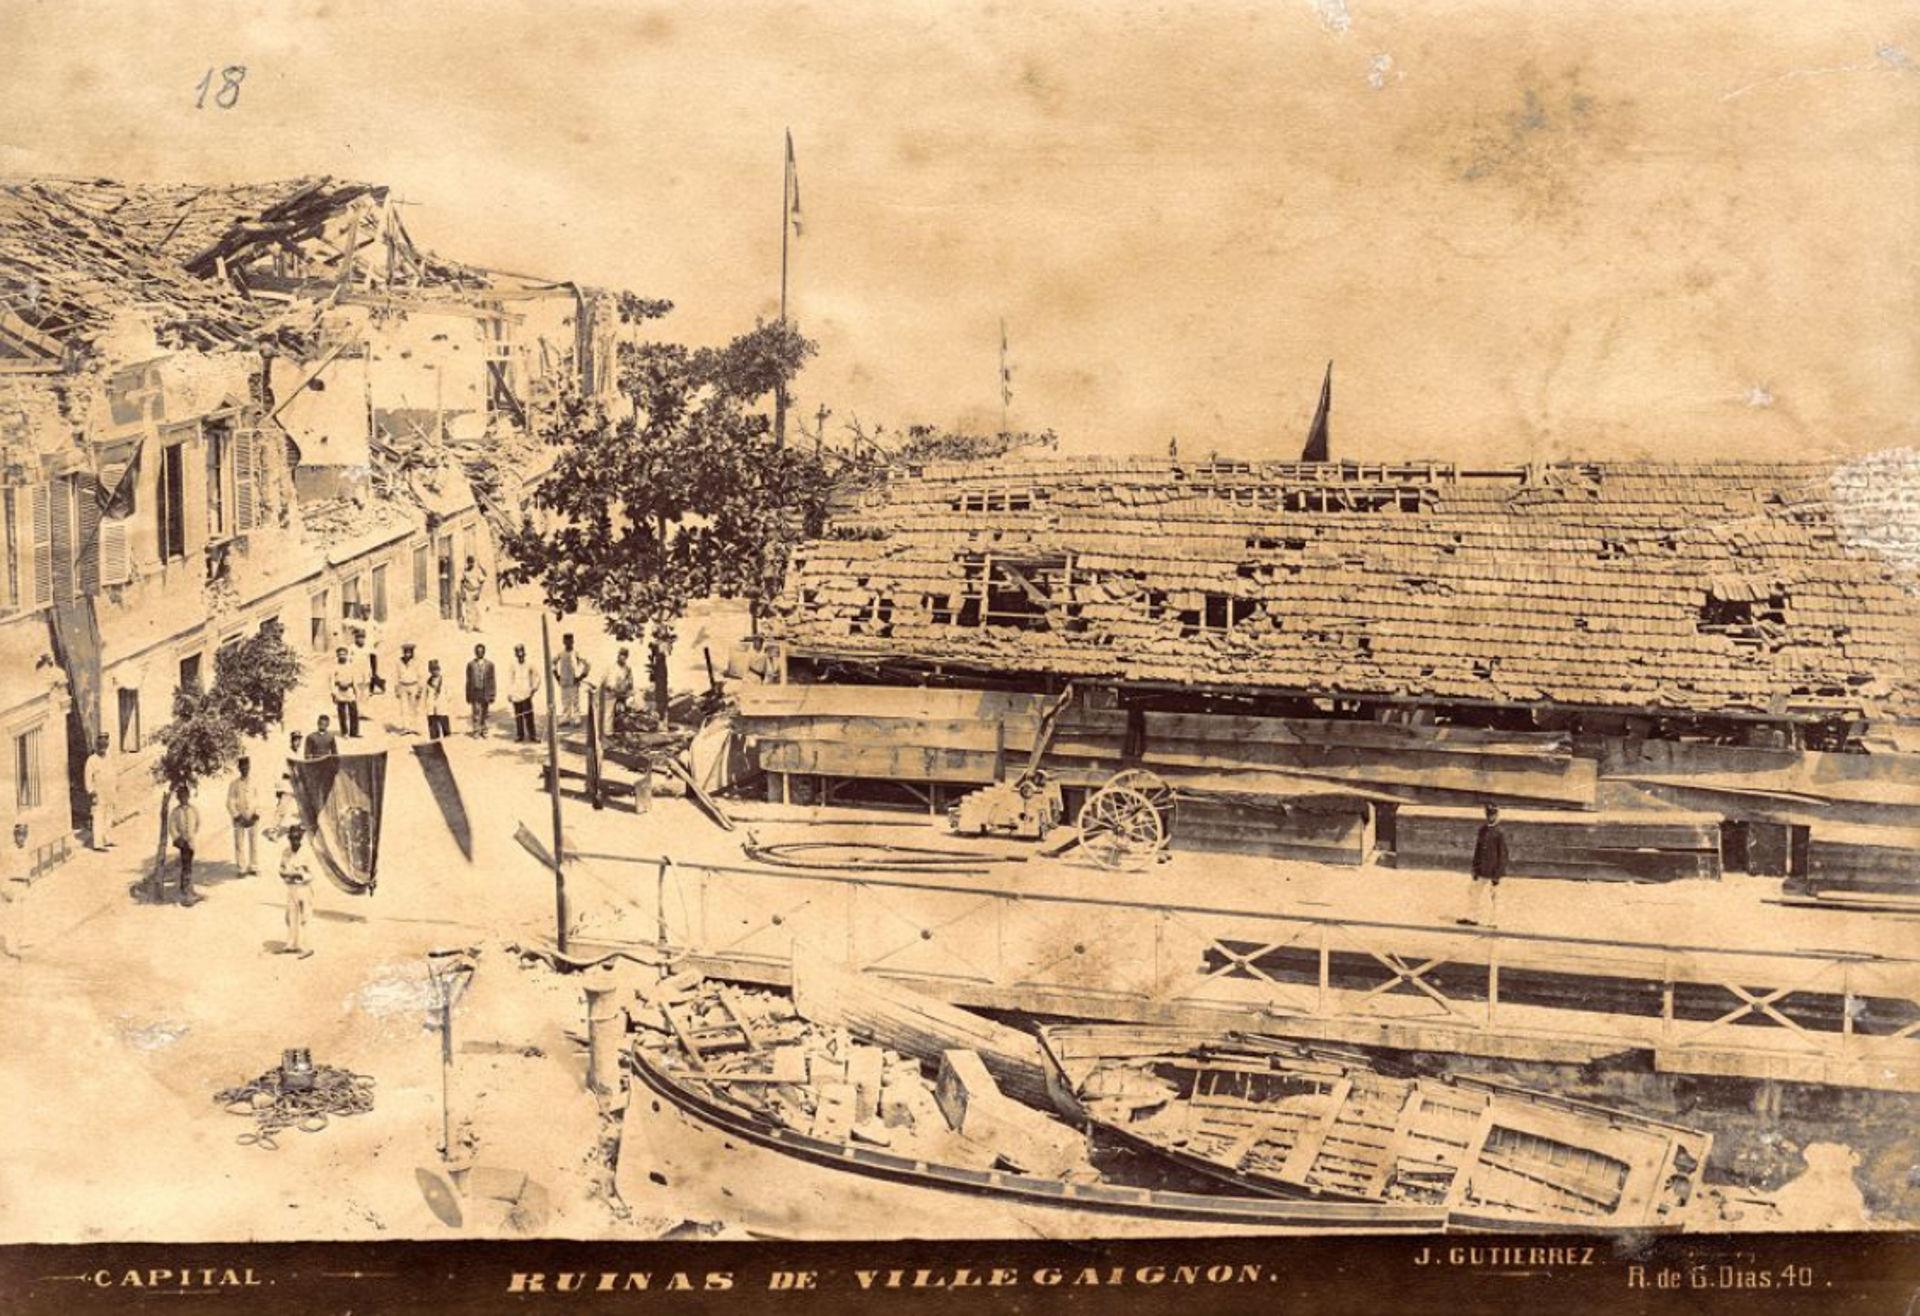 Ruínas de Villegaignon, c. 1893 (Juan Gutierrez/Acervo IMS)